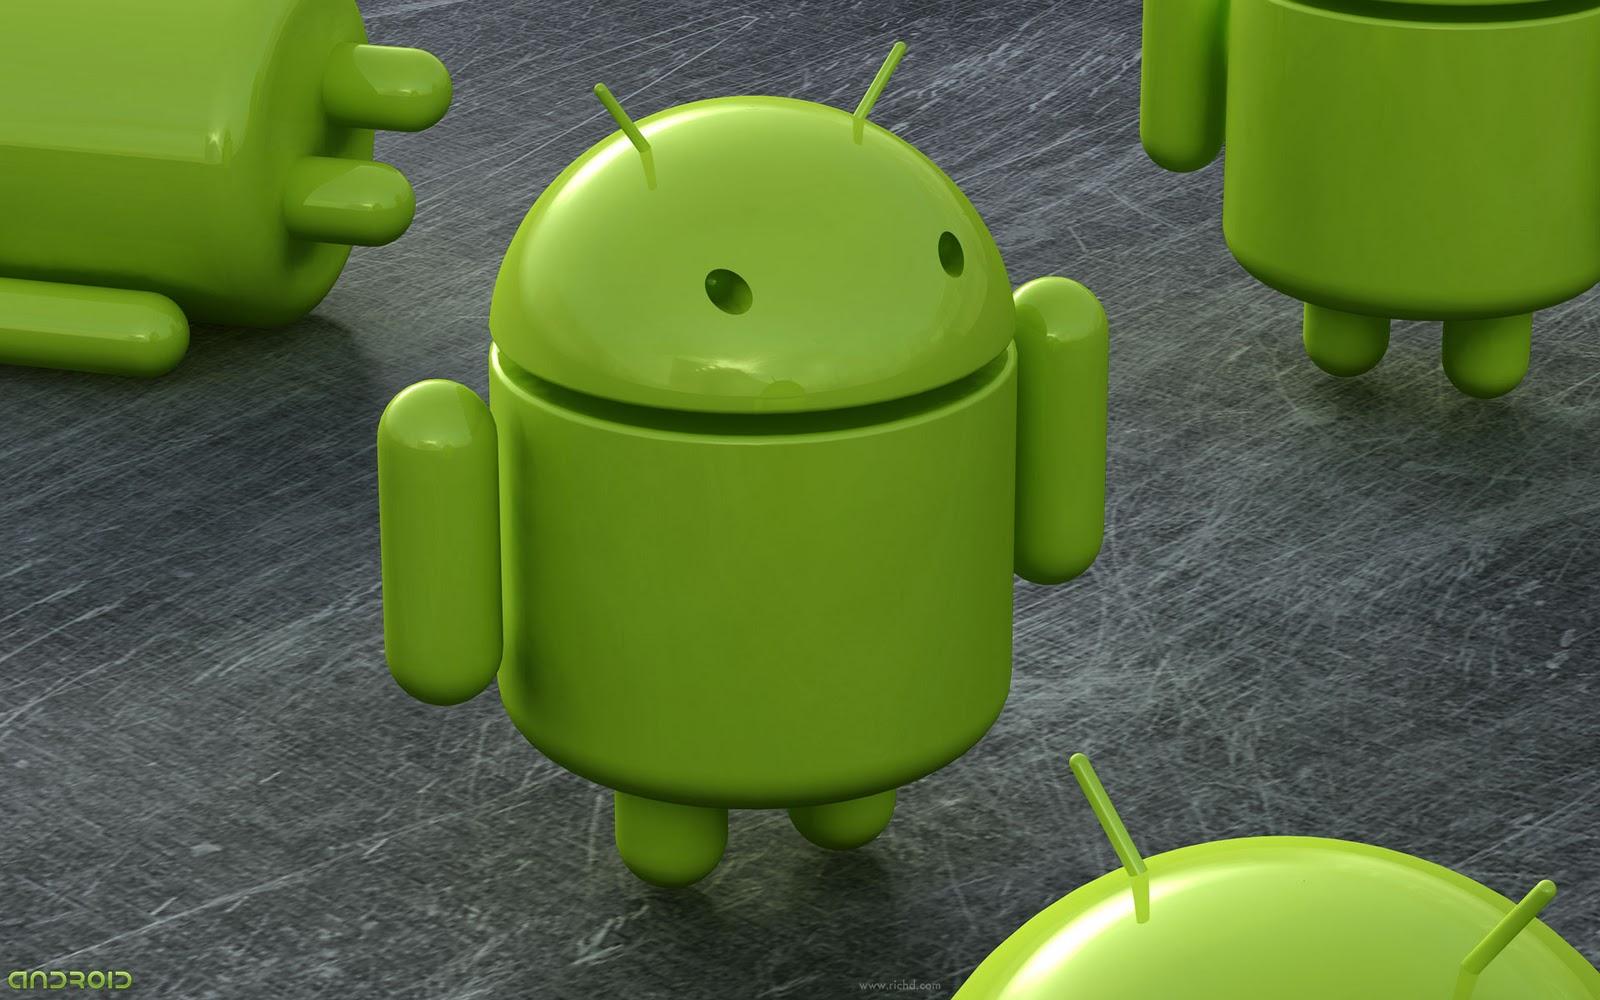 http://2.bp.blogspot.com/--zsTQ3Wc32M/TrKw4CYQcLI/AAAAAAAAArY/o0KPfKSWkQQ/s1600/richd-android1920.jpg